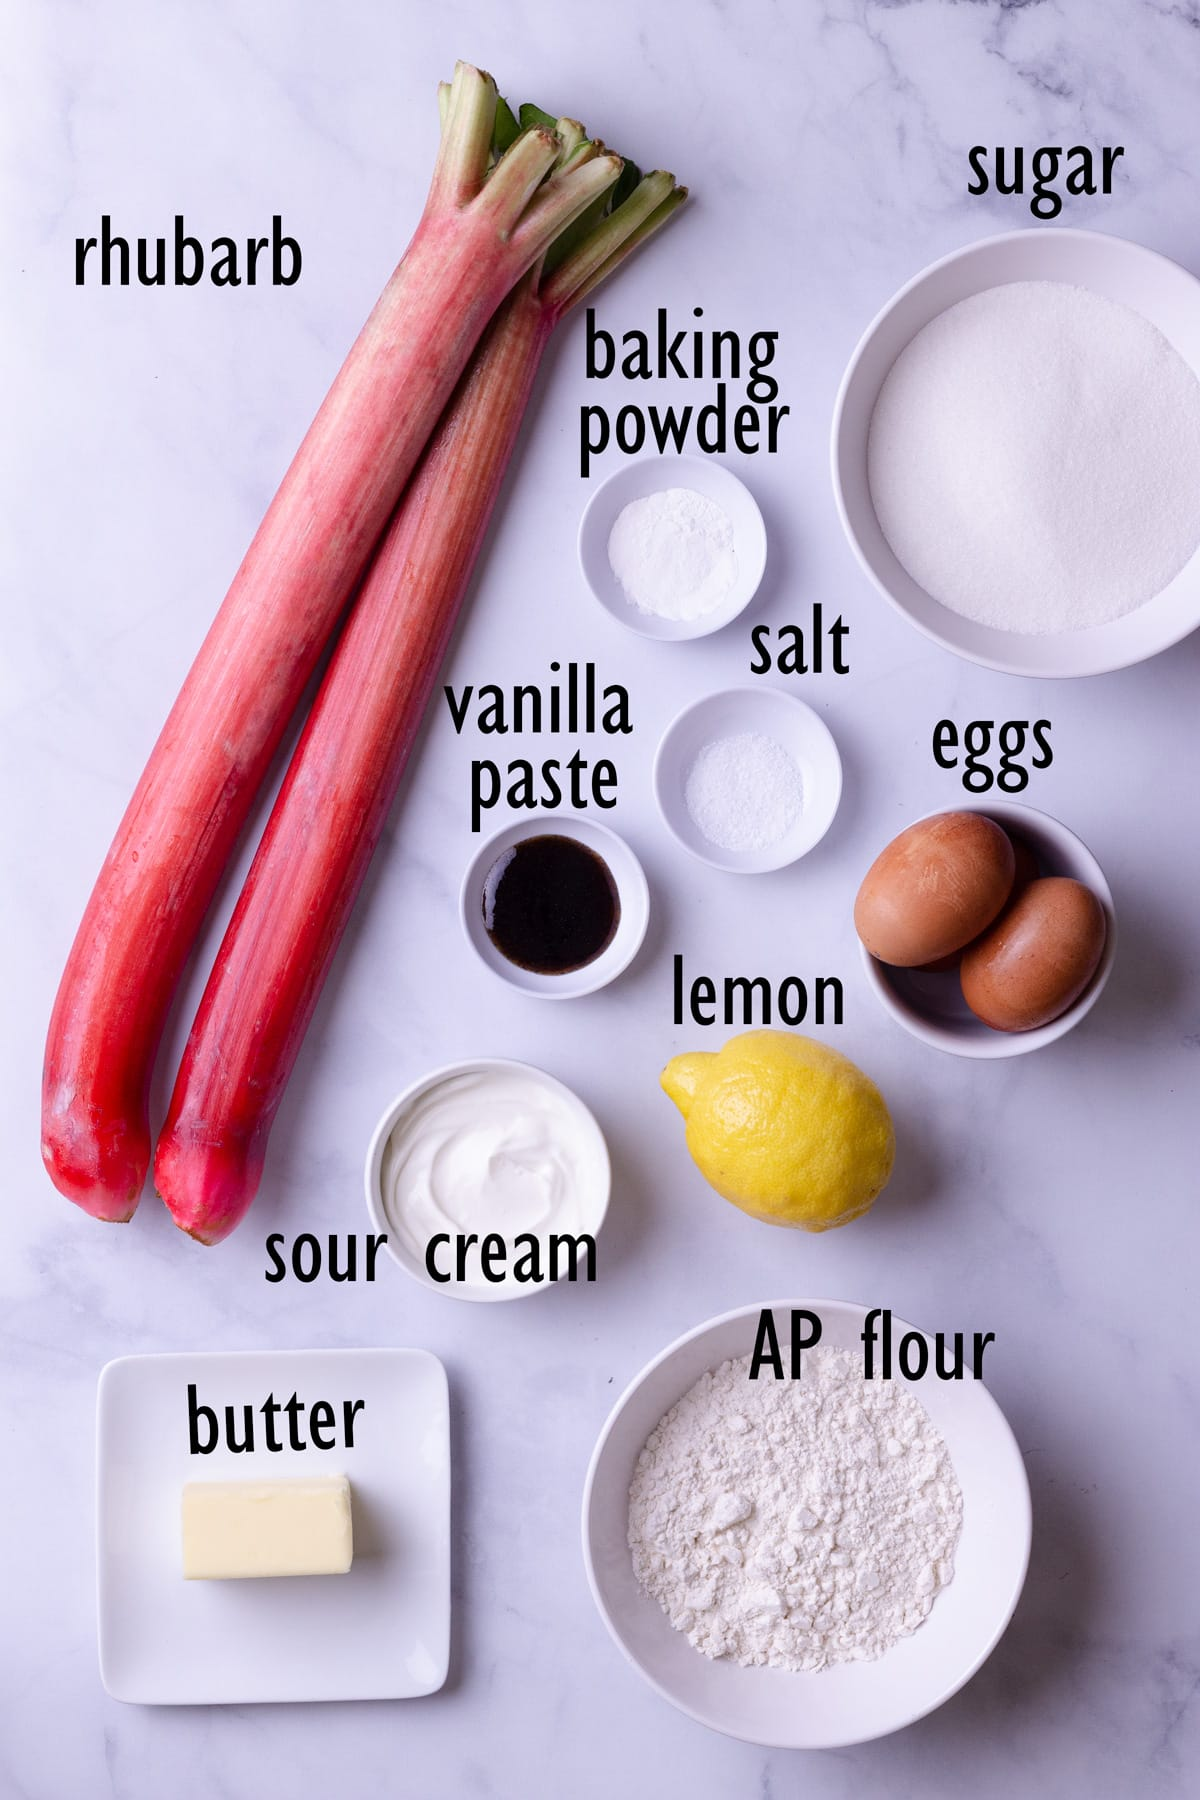 Ingredients including rhubarb, flour, sugar, eggs, baking powder, salt, lemon, butter, sour cream and vanilla.